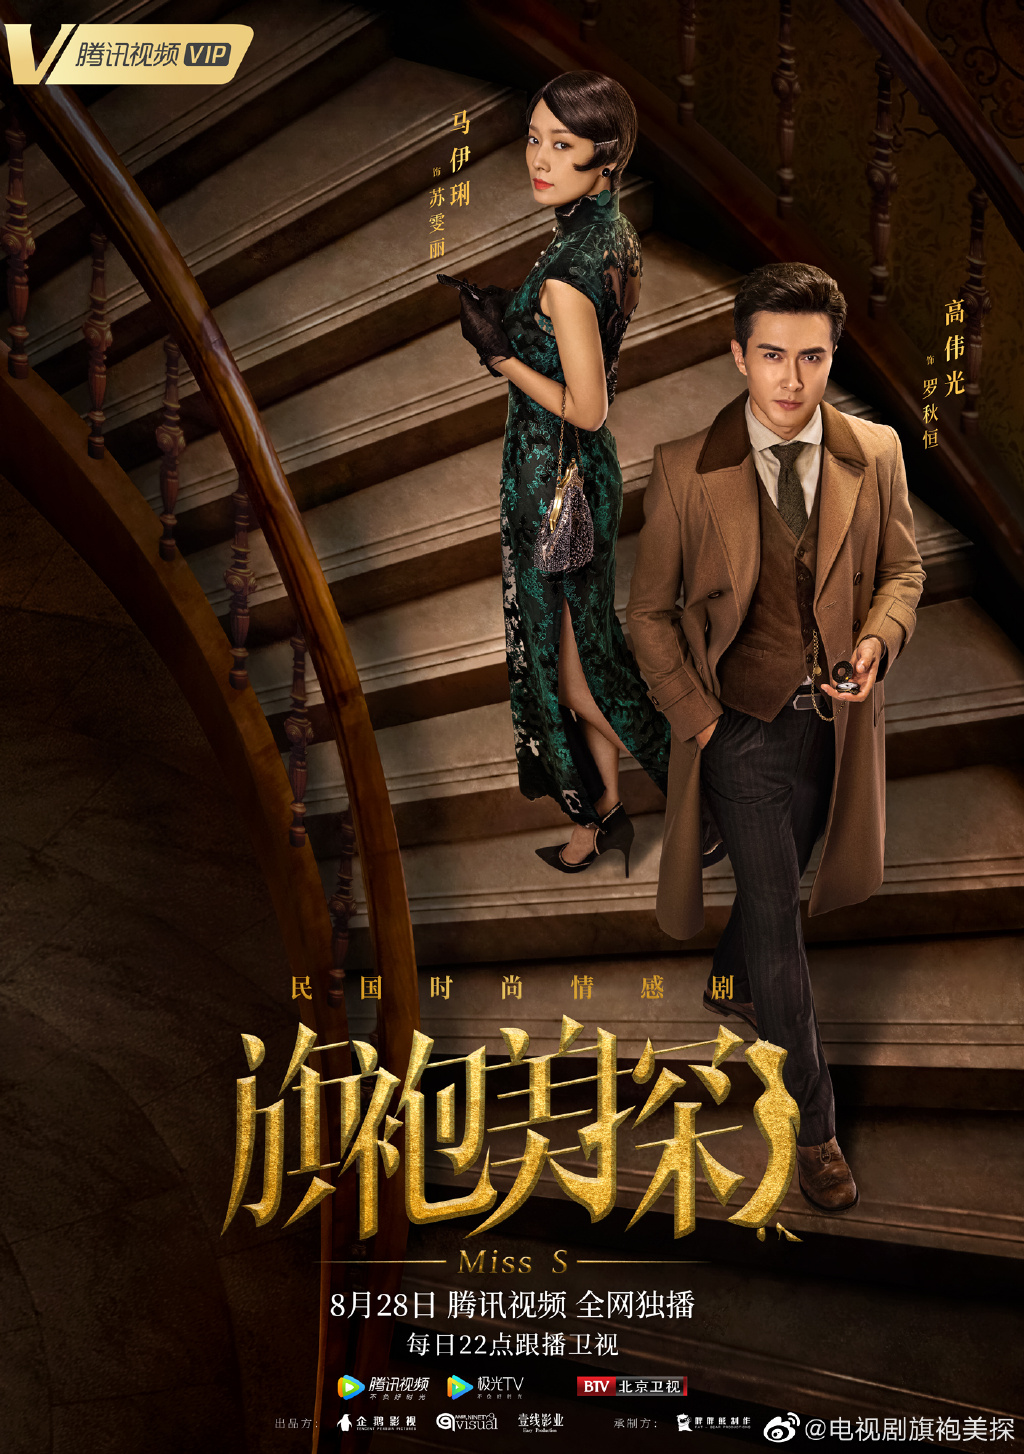 Miss S Chinese Drama Poster